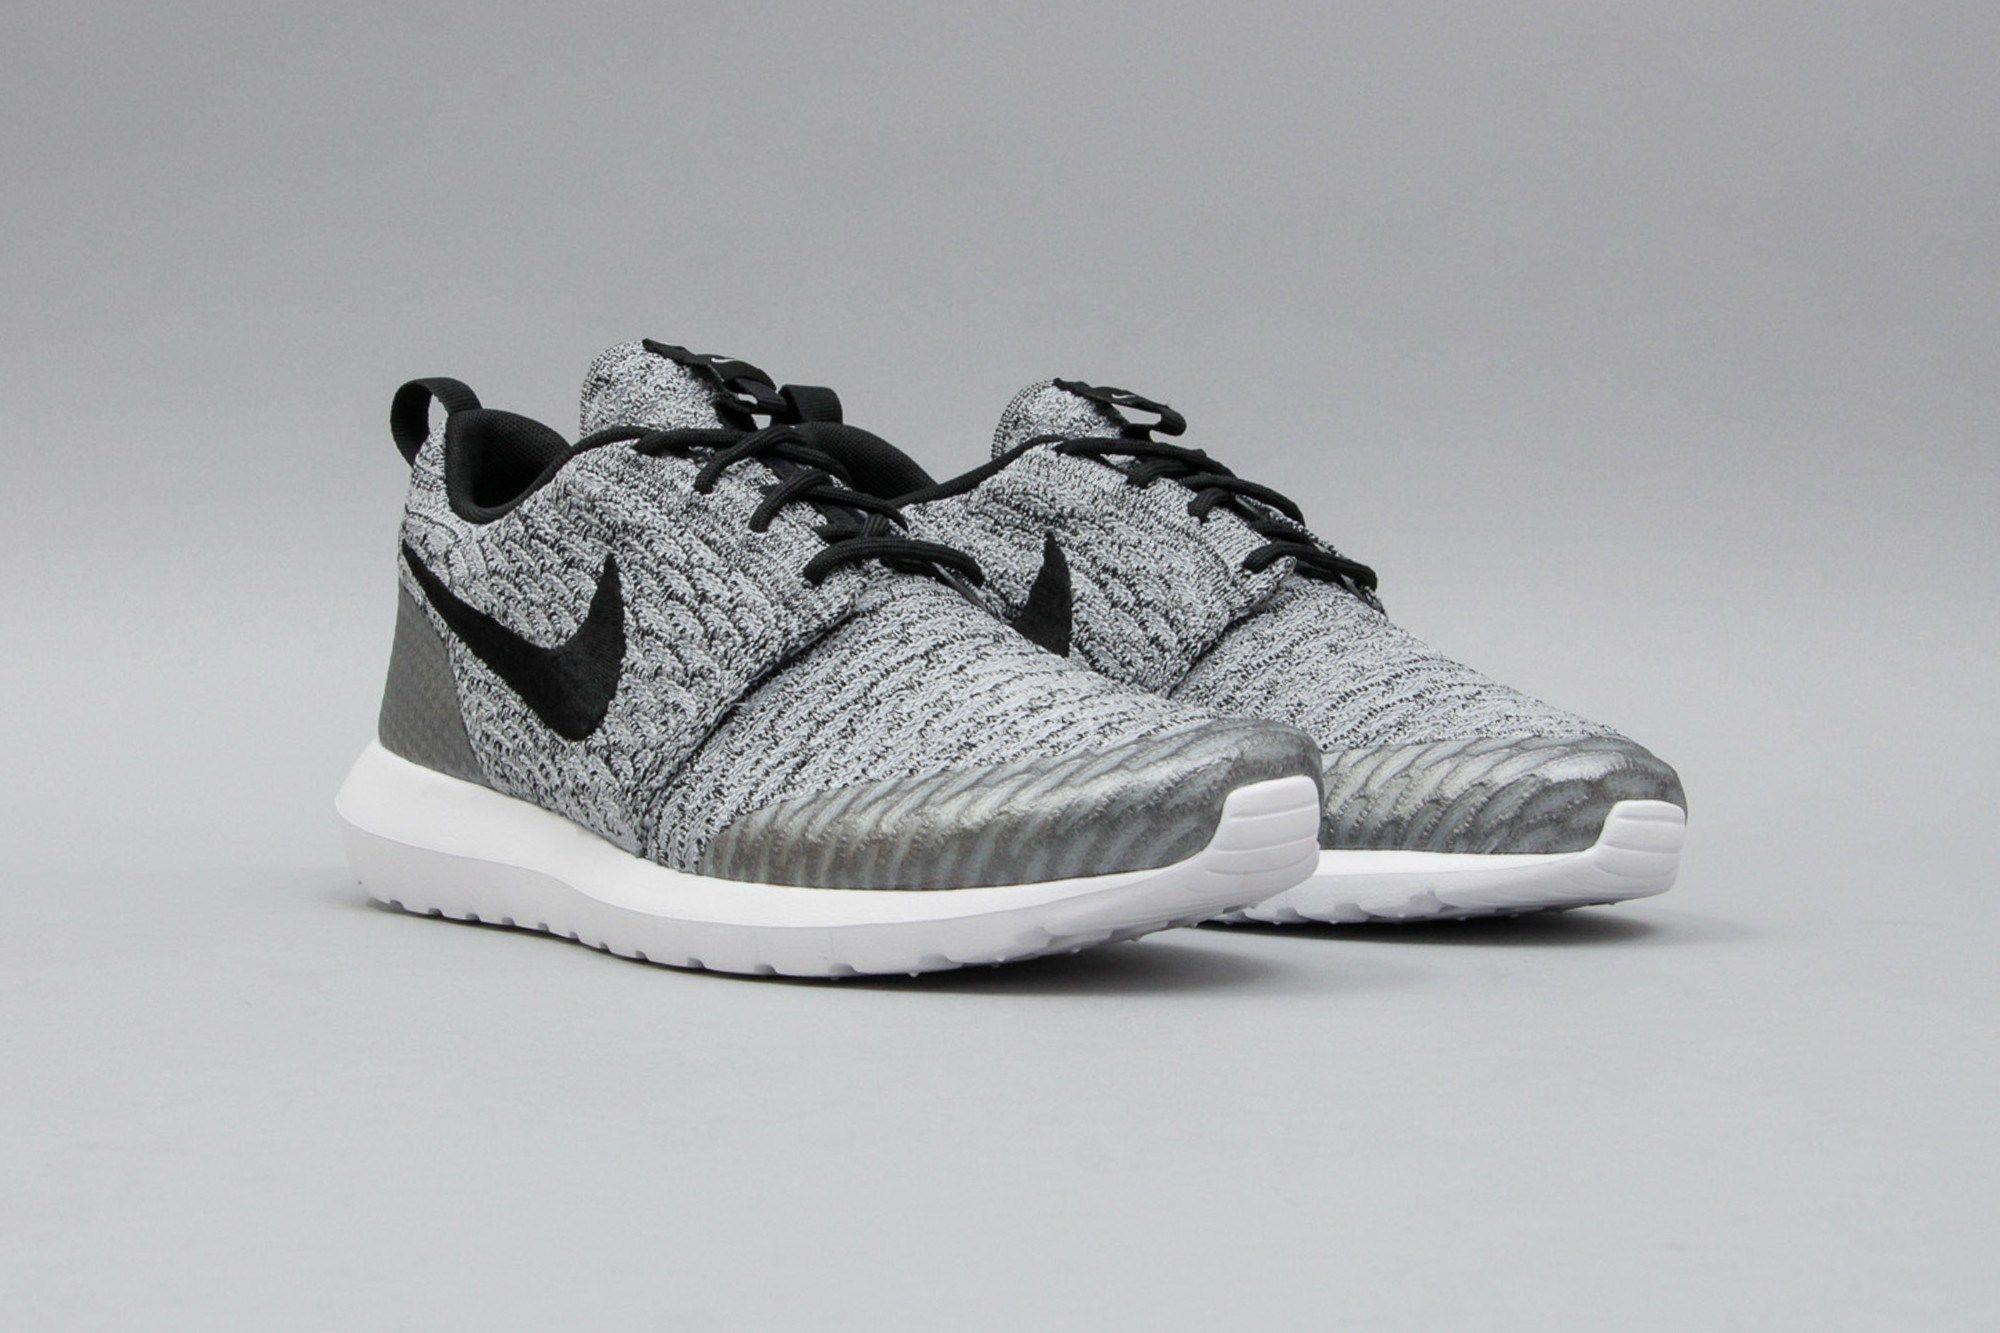 release date: 12123 93bc8 Nike Roshe One NM Flyknit SE Wolf Grey Black White 816531-002 (Grau) from B  V D S T